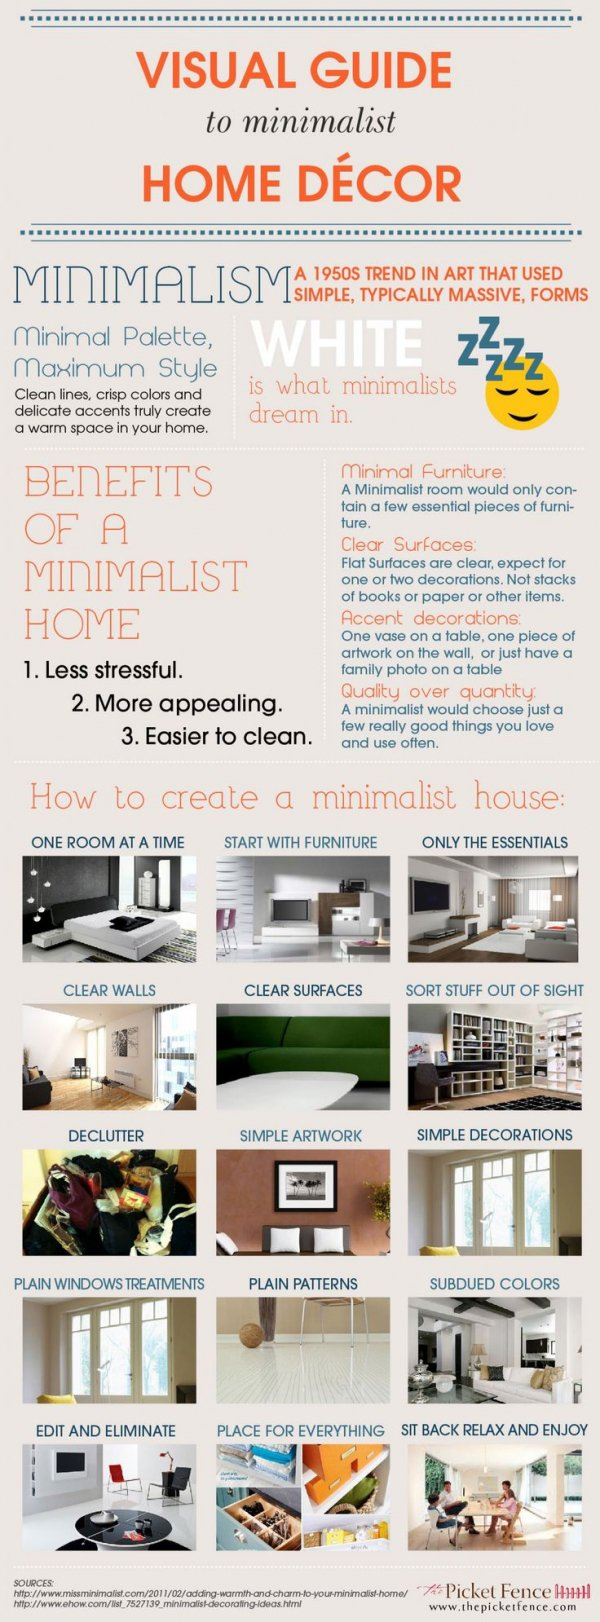 A Visual Guide to Minimalist Home Decor